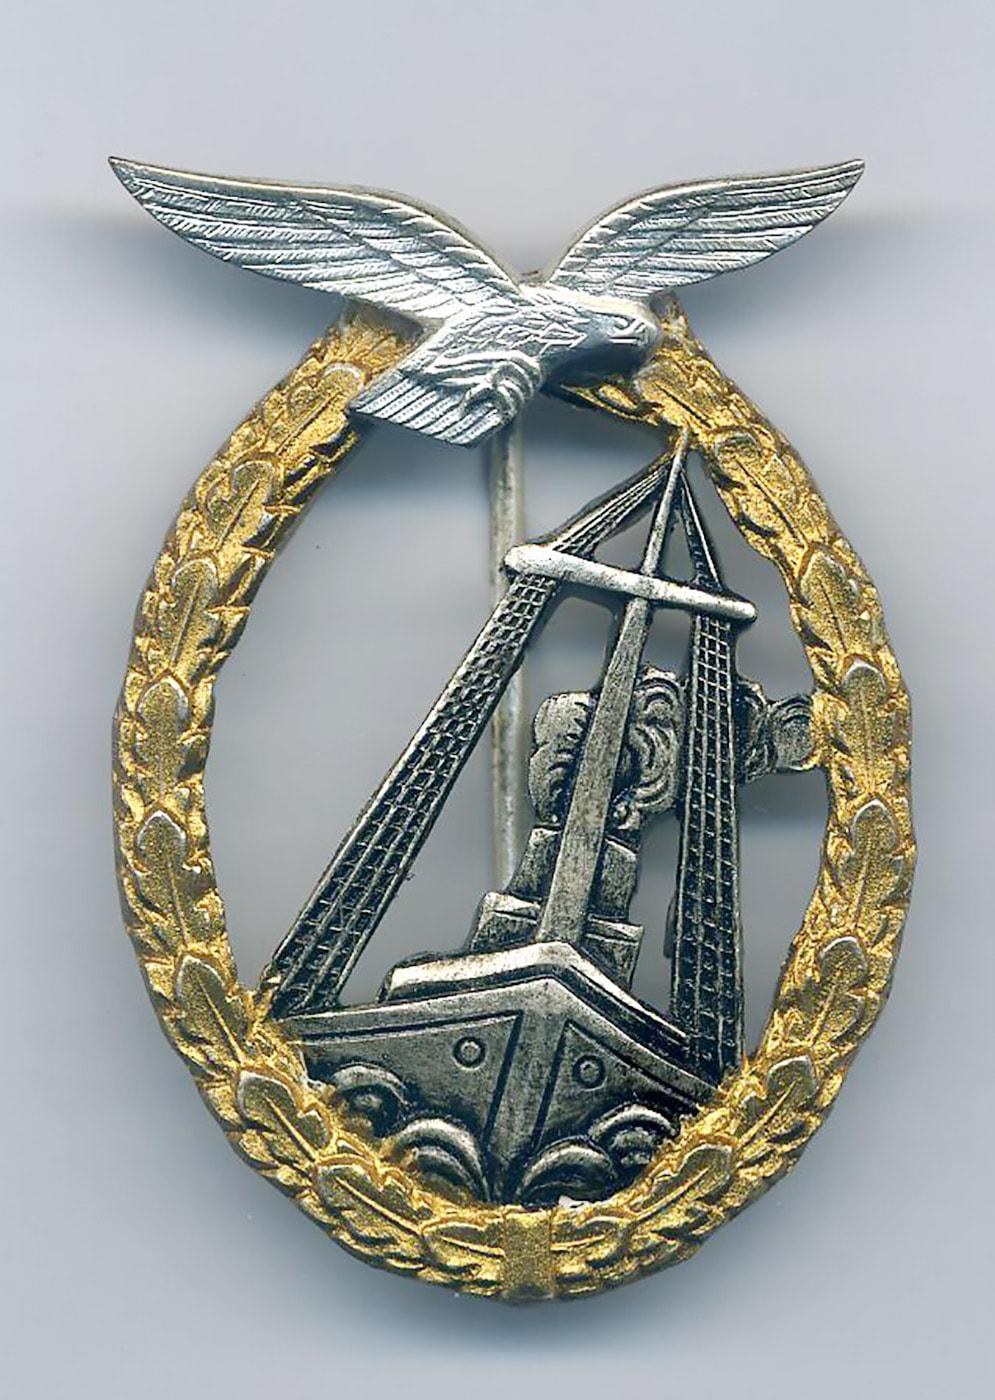 Fake Nazi awards - Militaria History